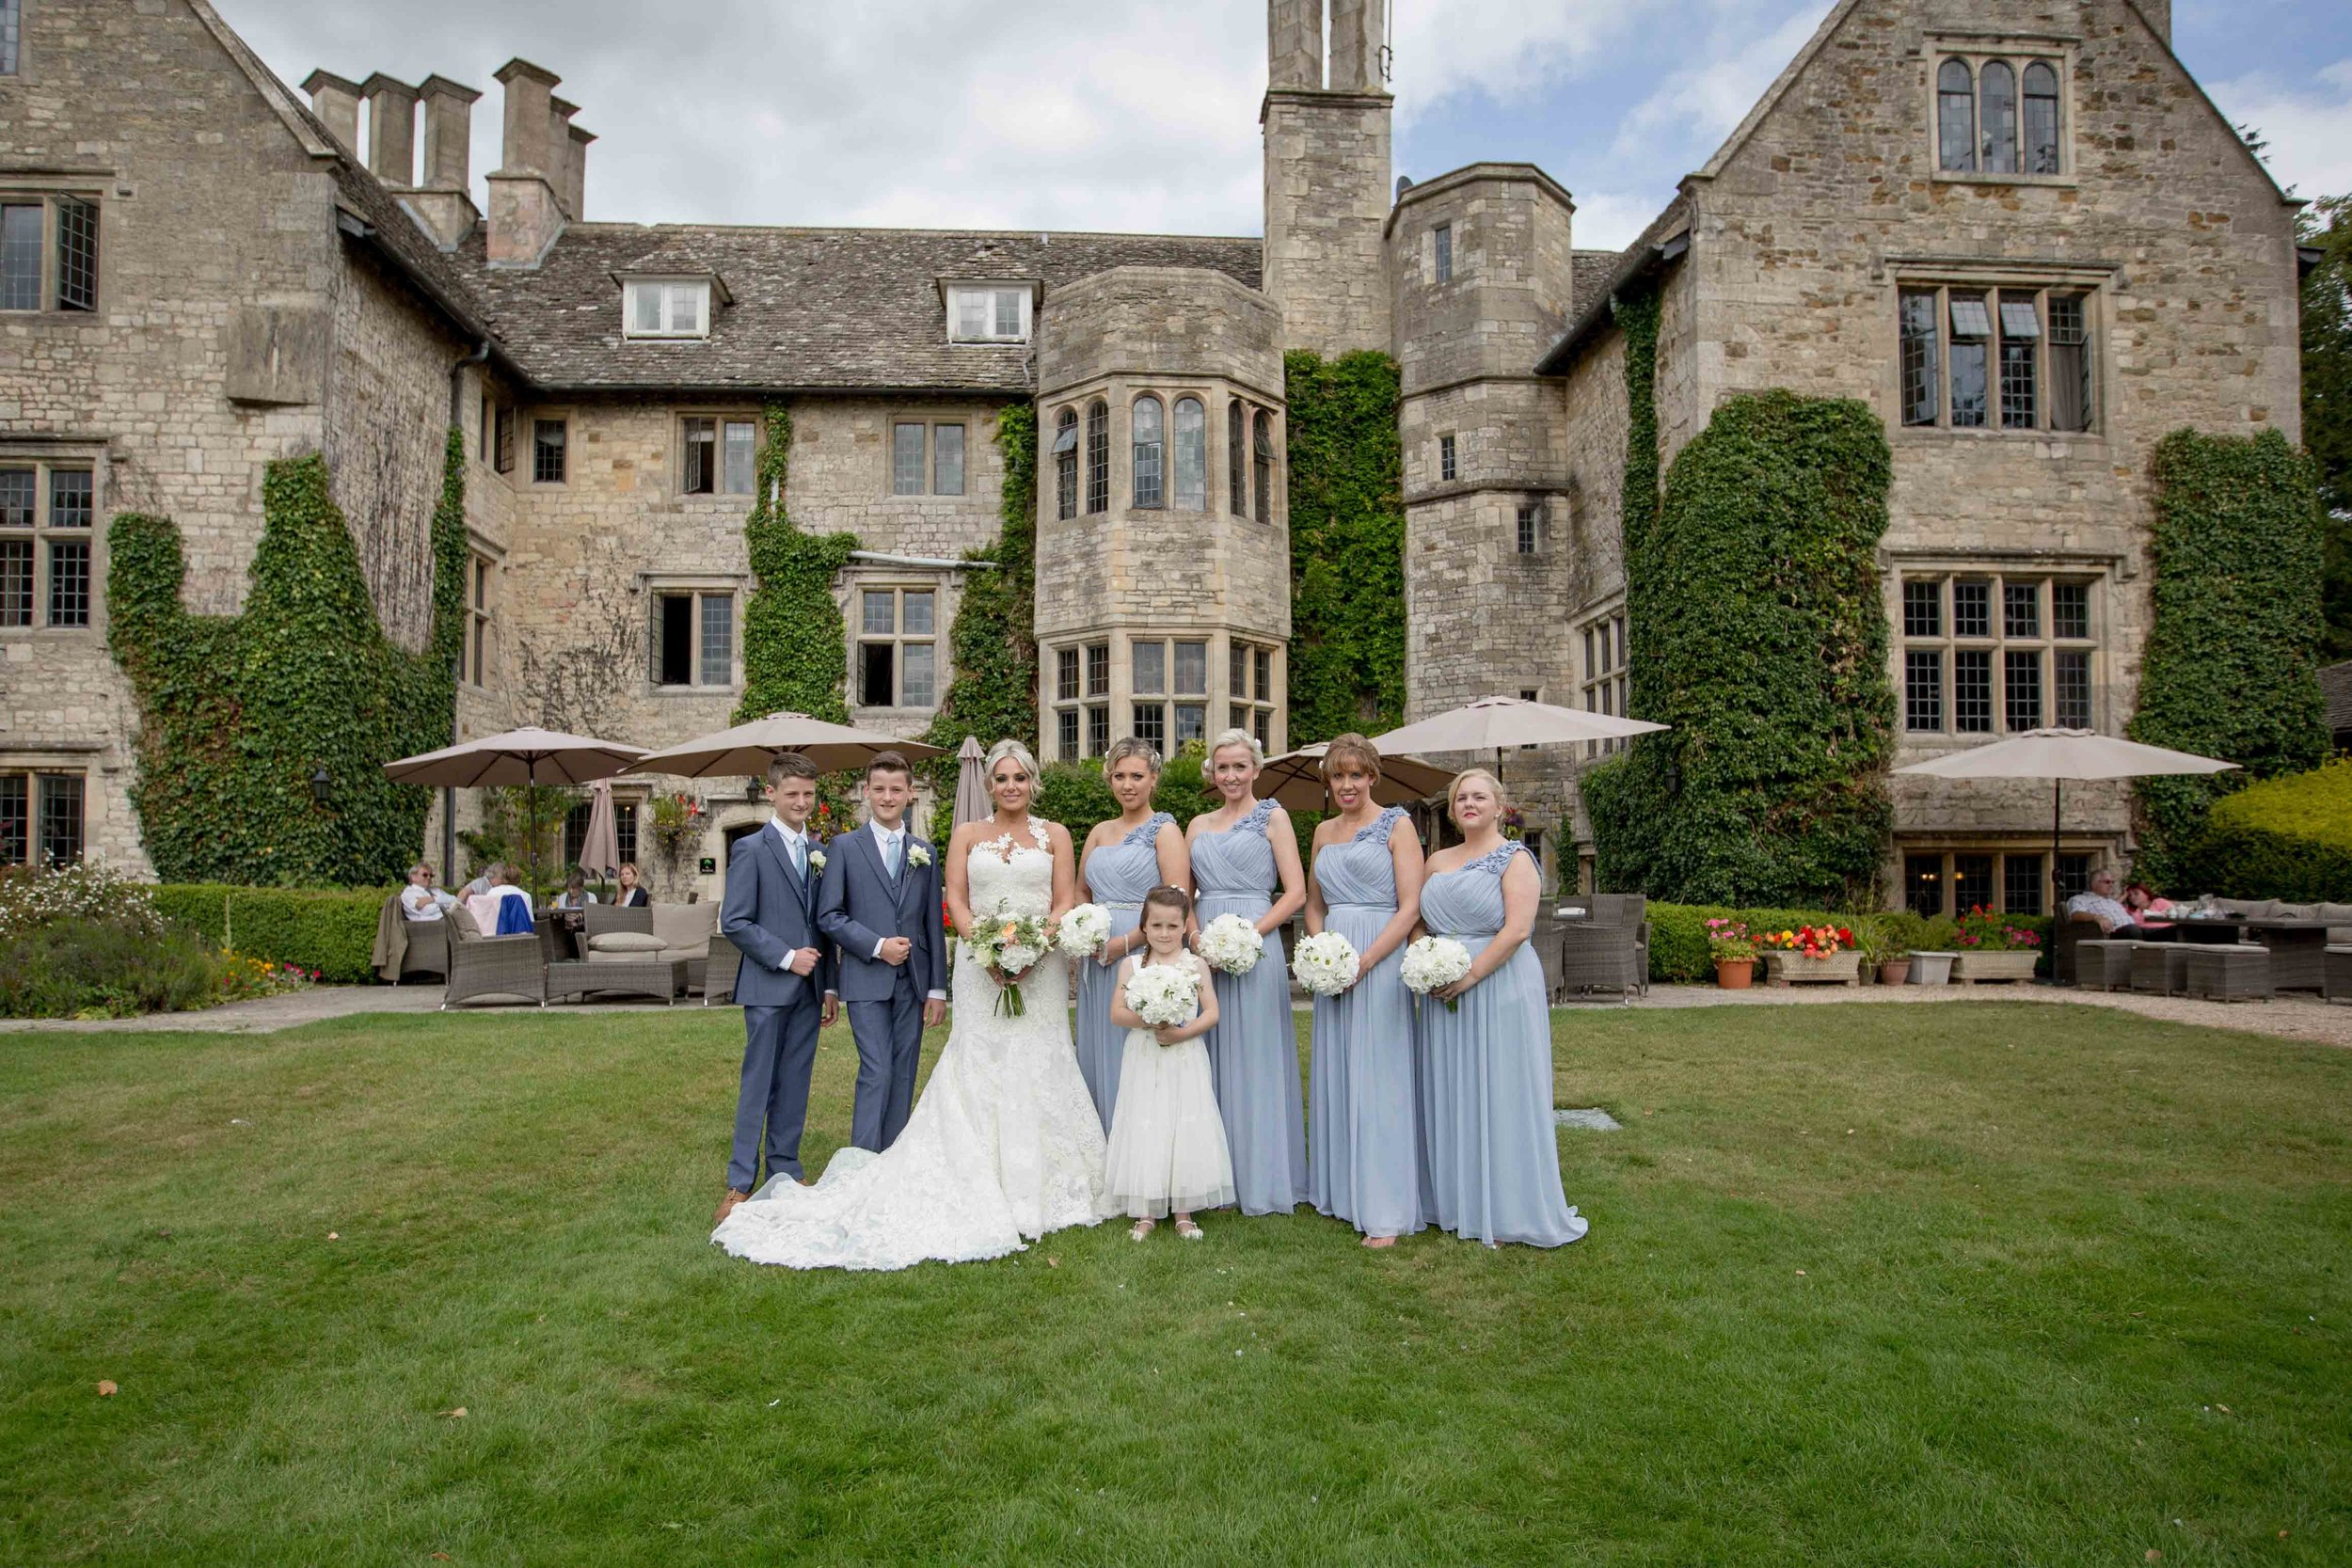 cotswold-wedding-photography-at-stonehouse-court-hotel-natalia-smith-photography-gloucestershire-wedding-photographer-29.jpg